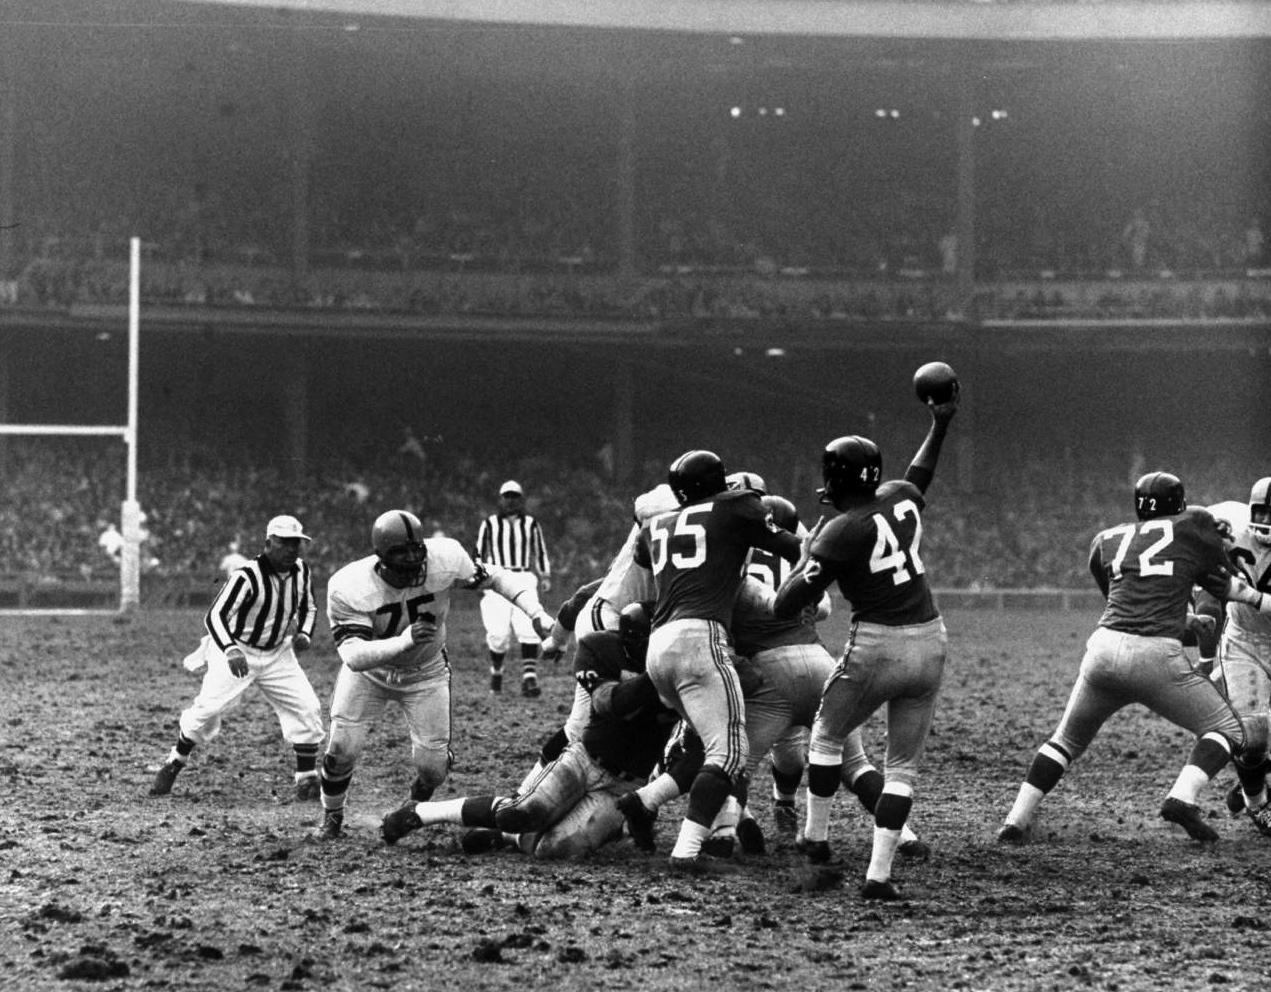 Vintage Football Photos 1